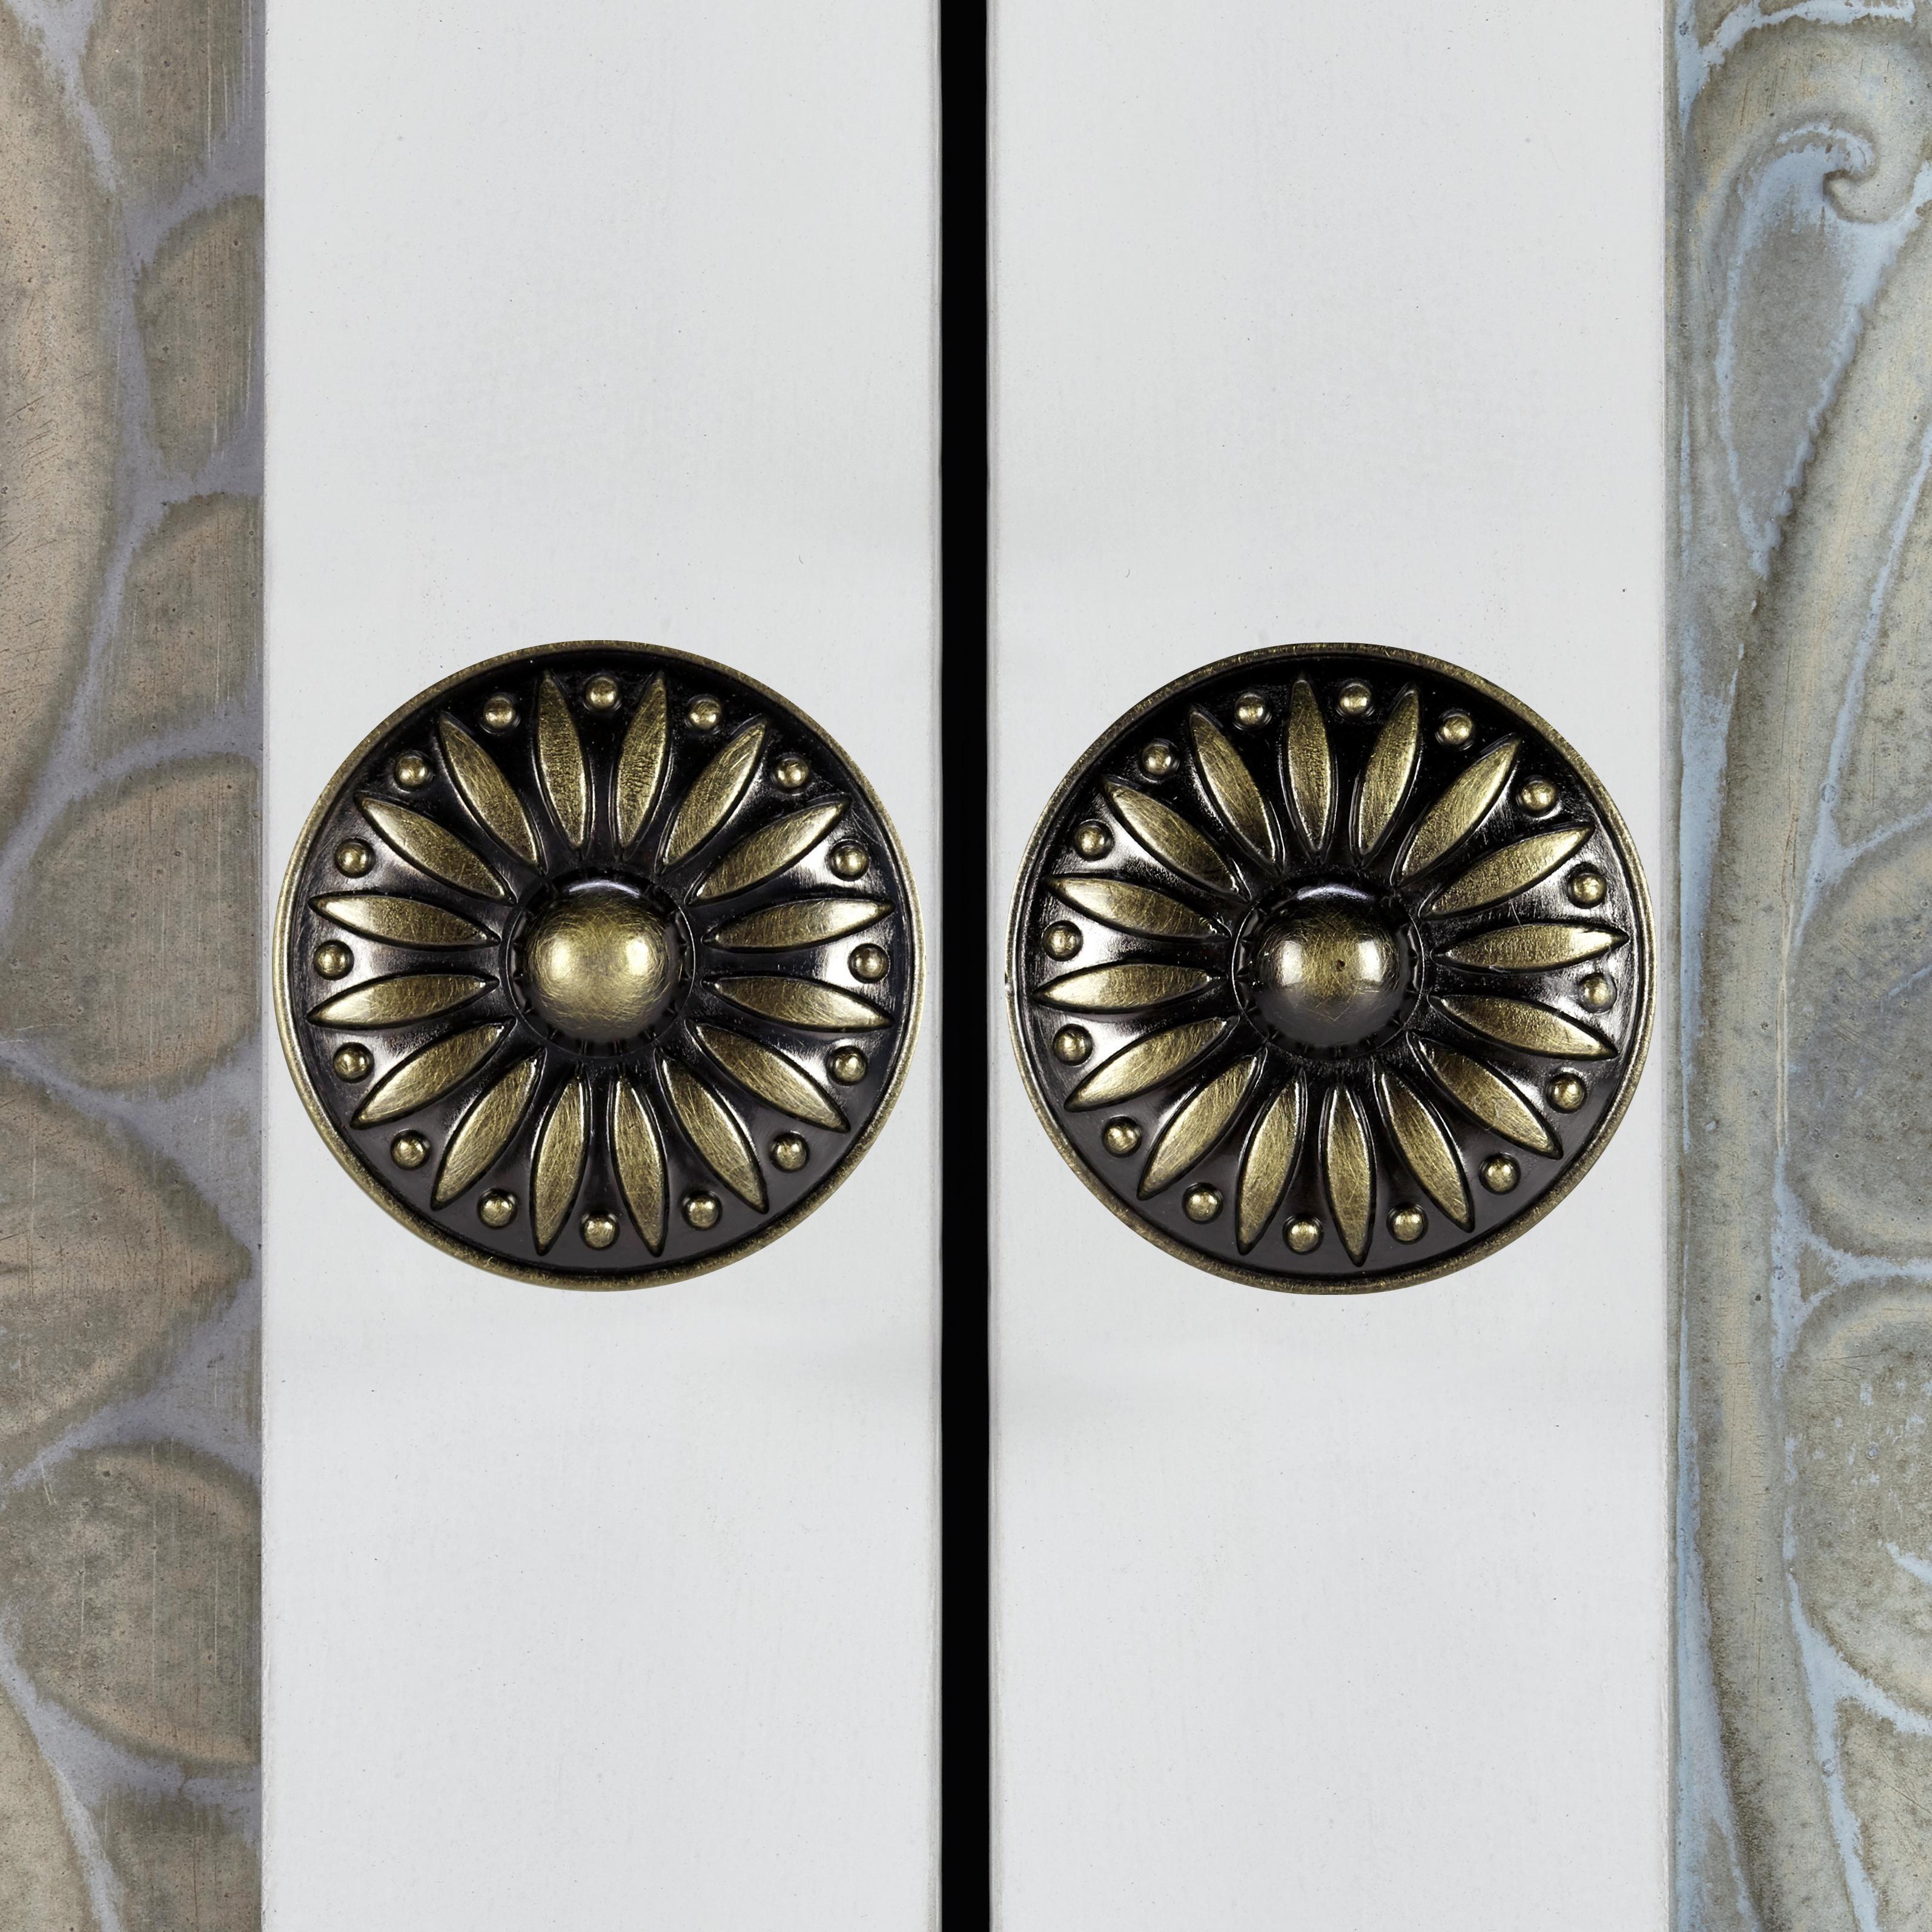 Schrank Avery - Beige/Weiß, MODERN, Holz/Metall (85/120/38cm) - PREMIUM LIVING